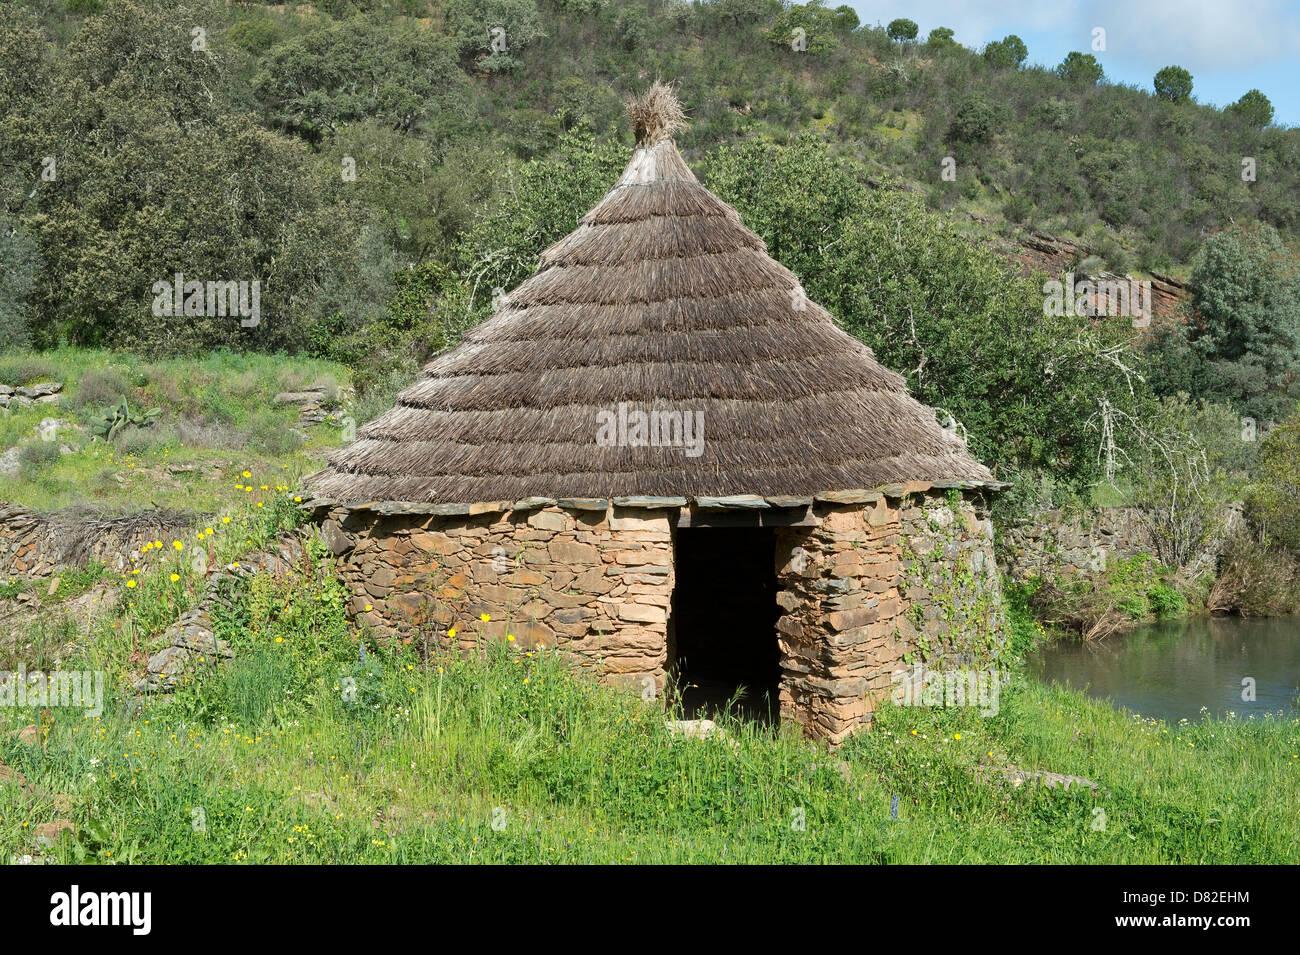 Round house at Mealha Masmarrta Trail Brás de Alportel Algarve Portugal Mediterranean Europe - Stock Image